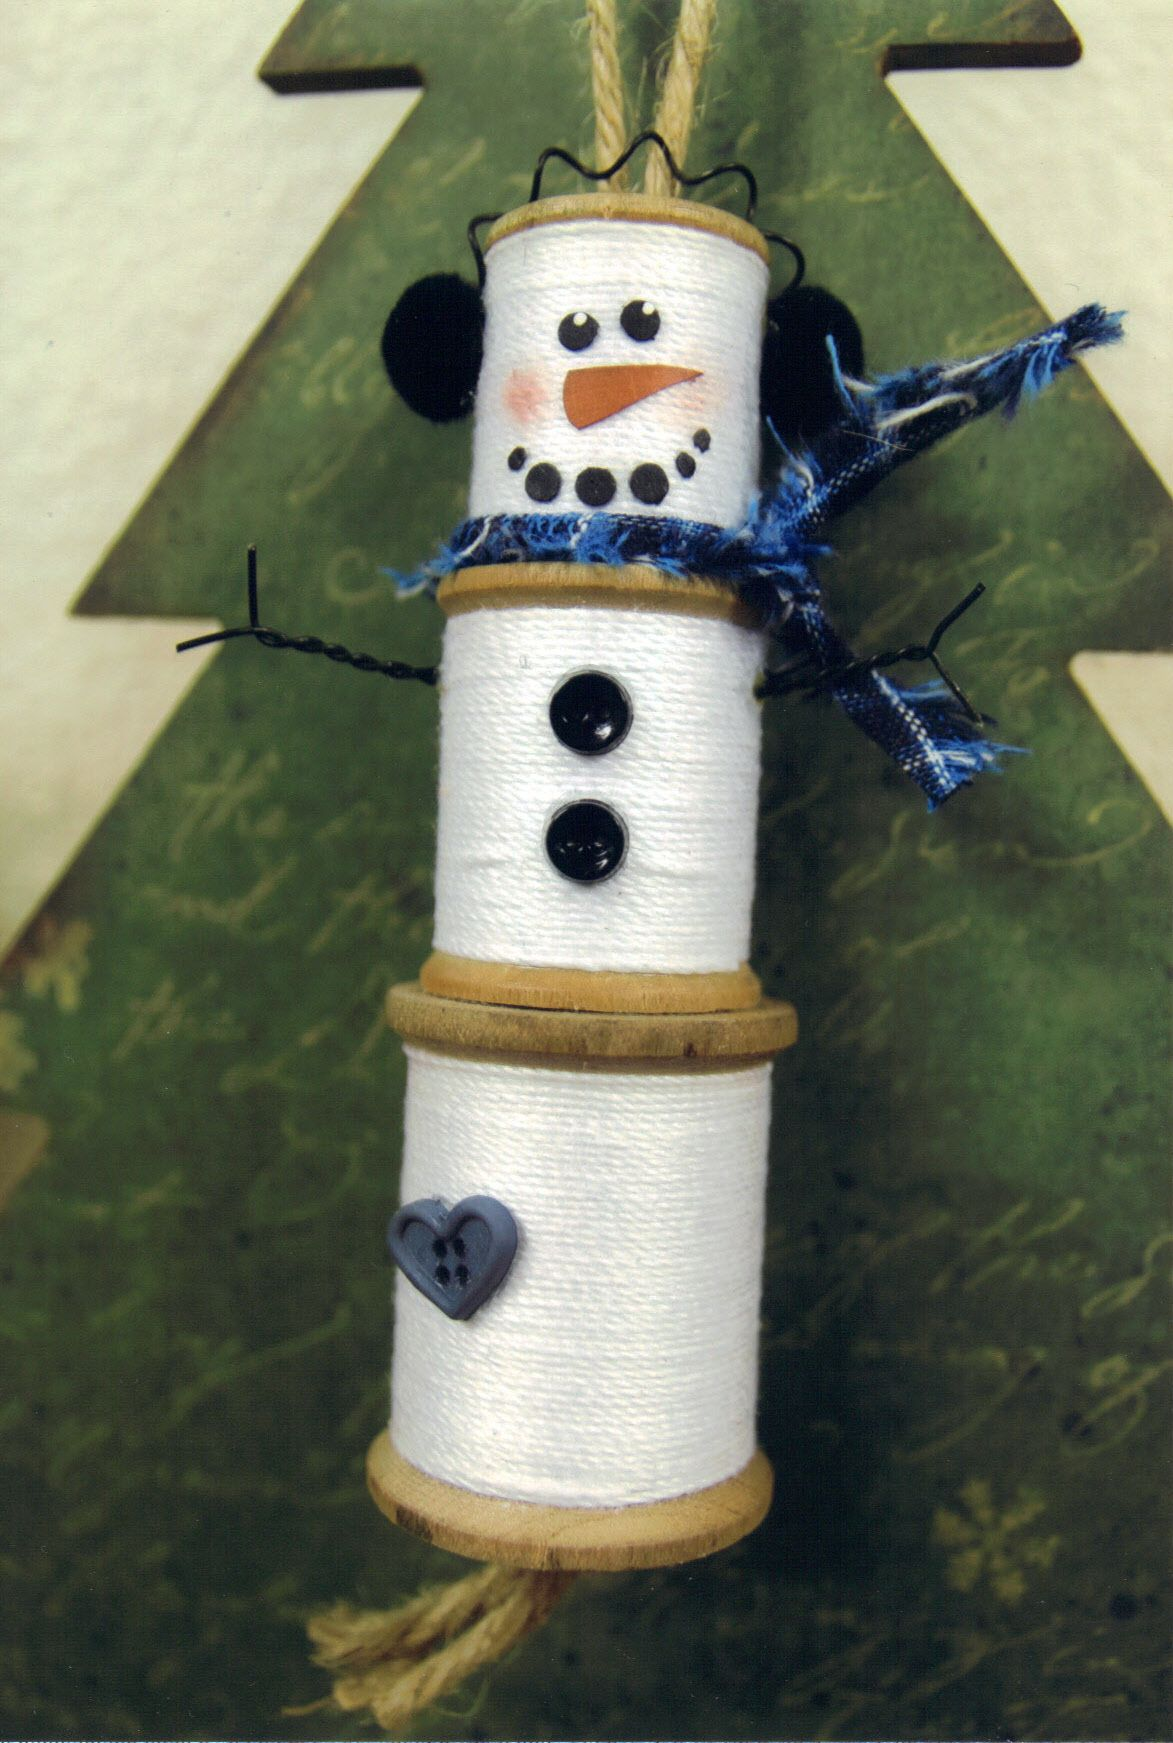 Lastminute Wooden Spools Snowman … Christmas ornaments